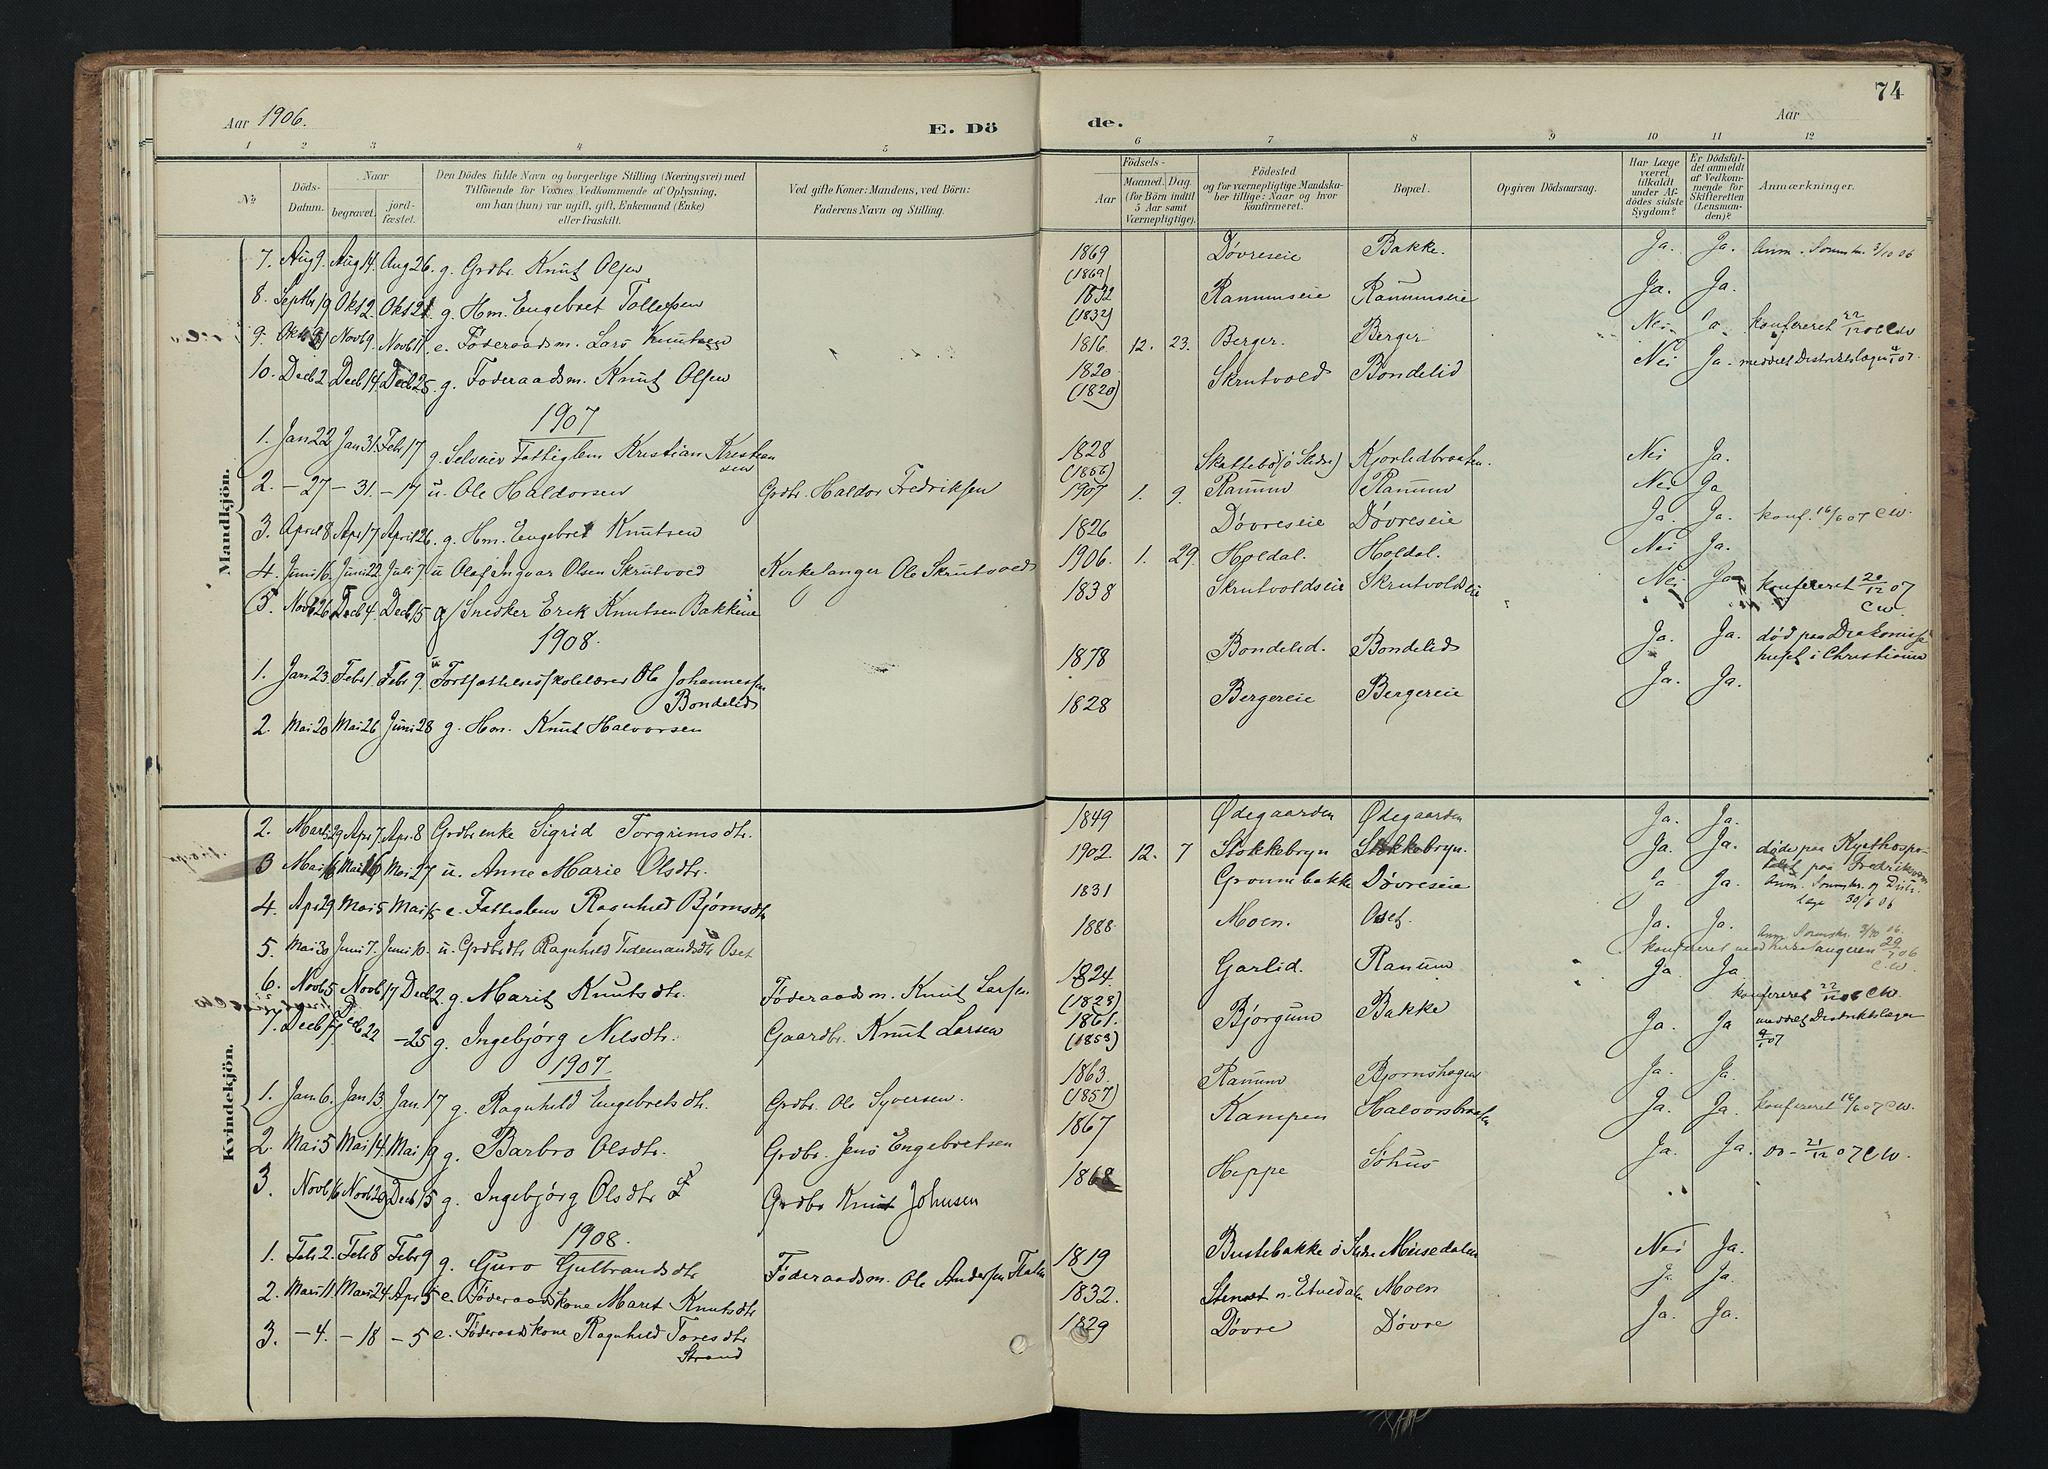 SAH, Nord-Aurdal prestekontor, Ministerialbok nr. 15, 1896-1914, s. 74